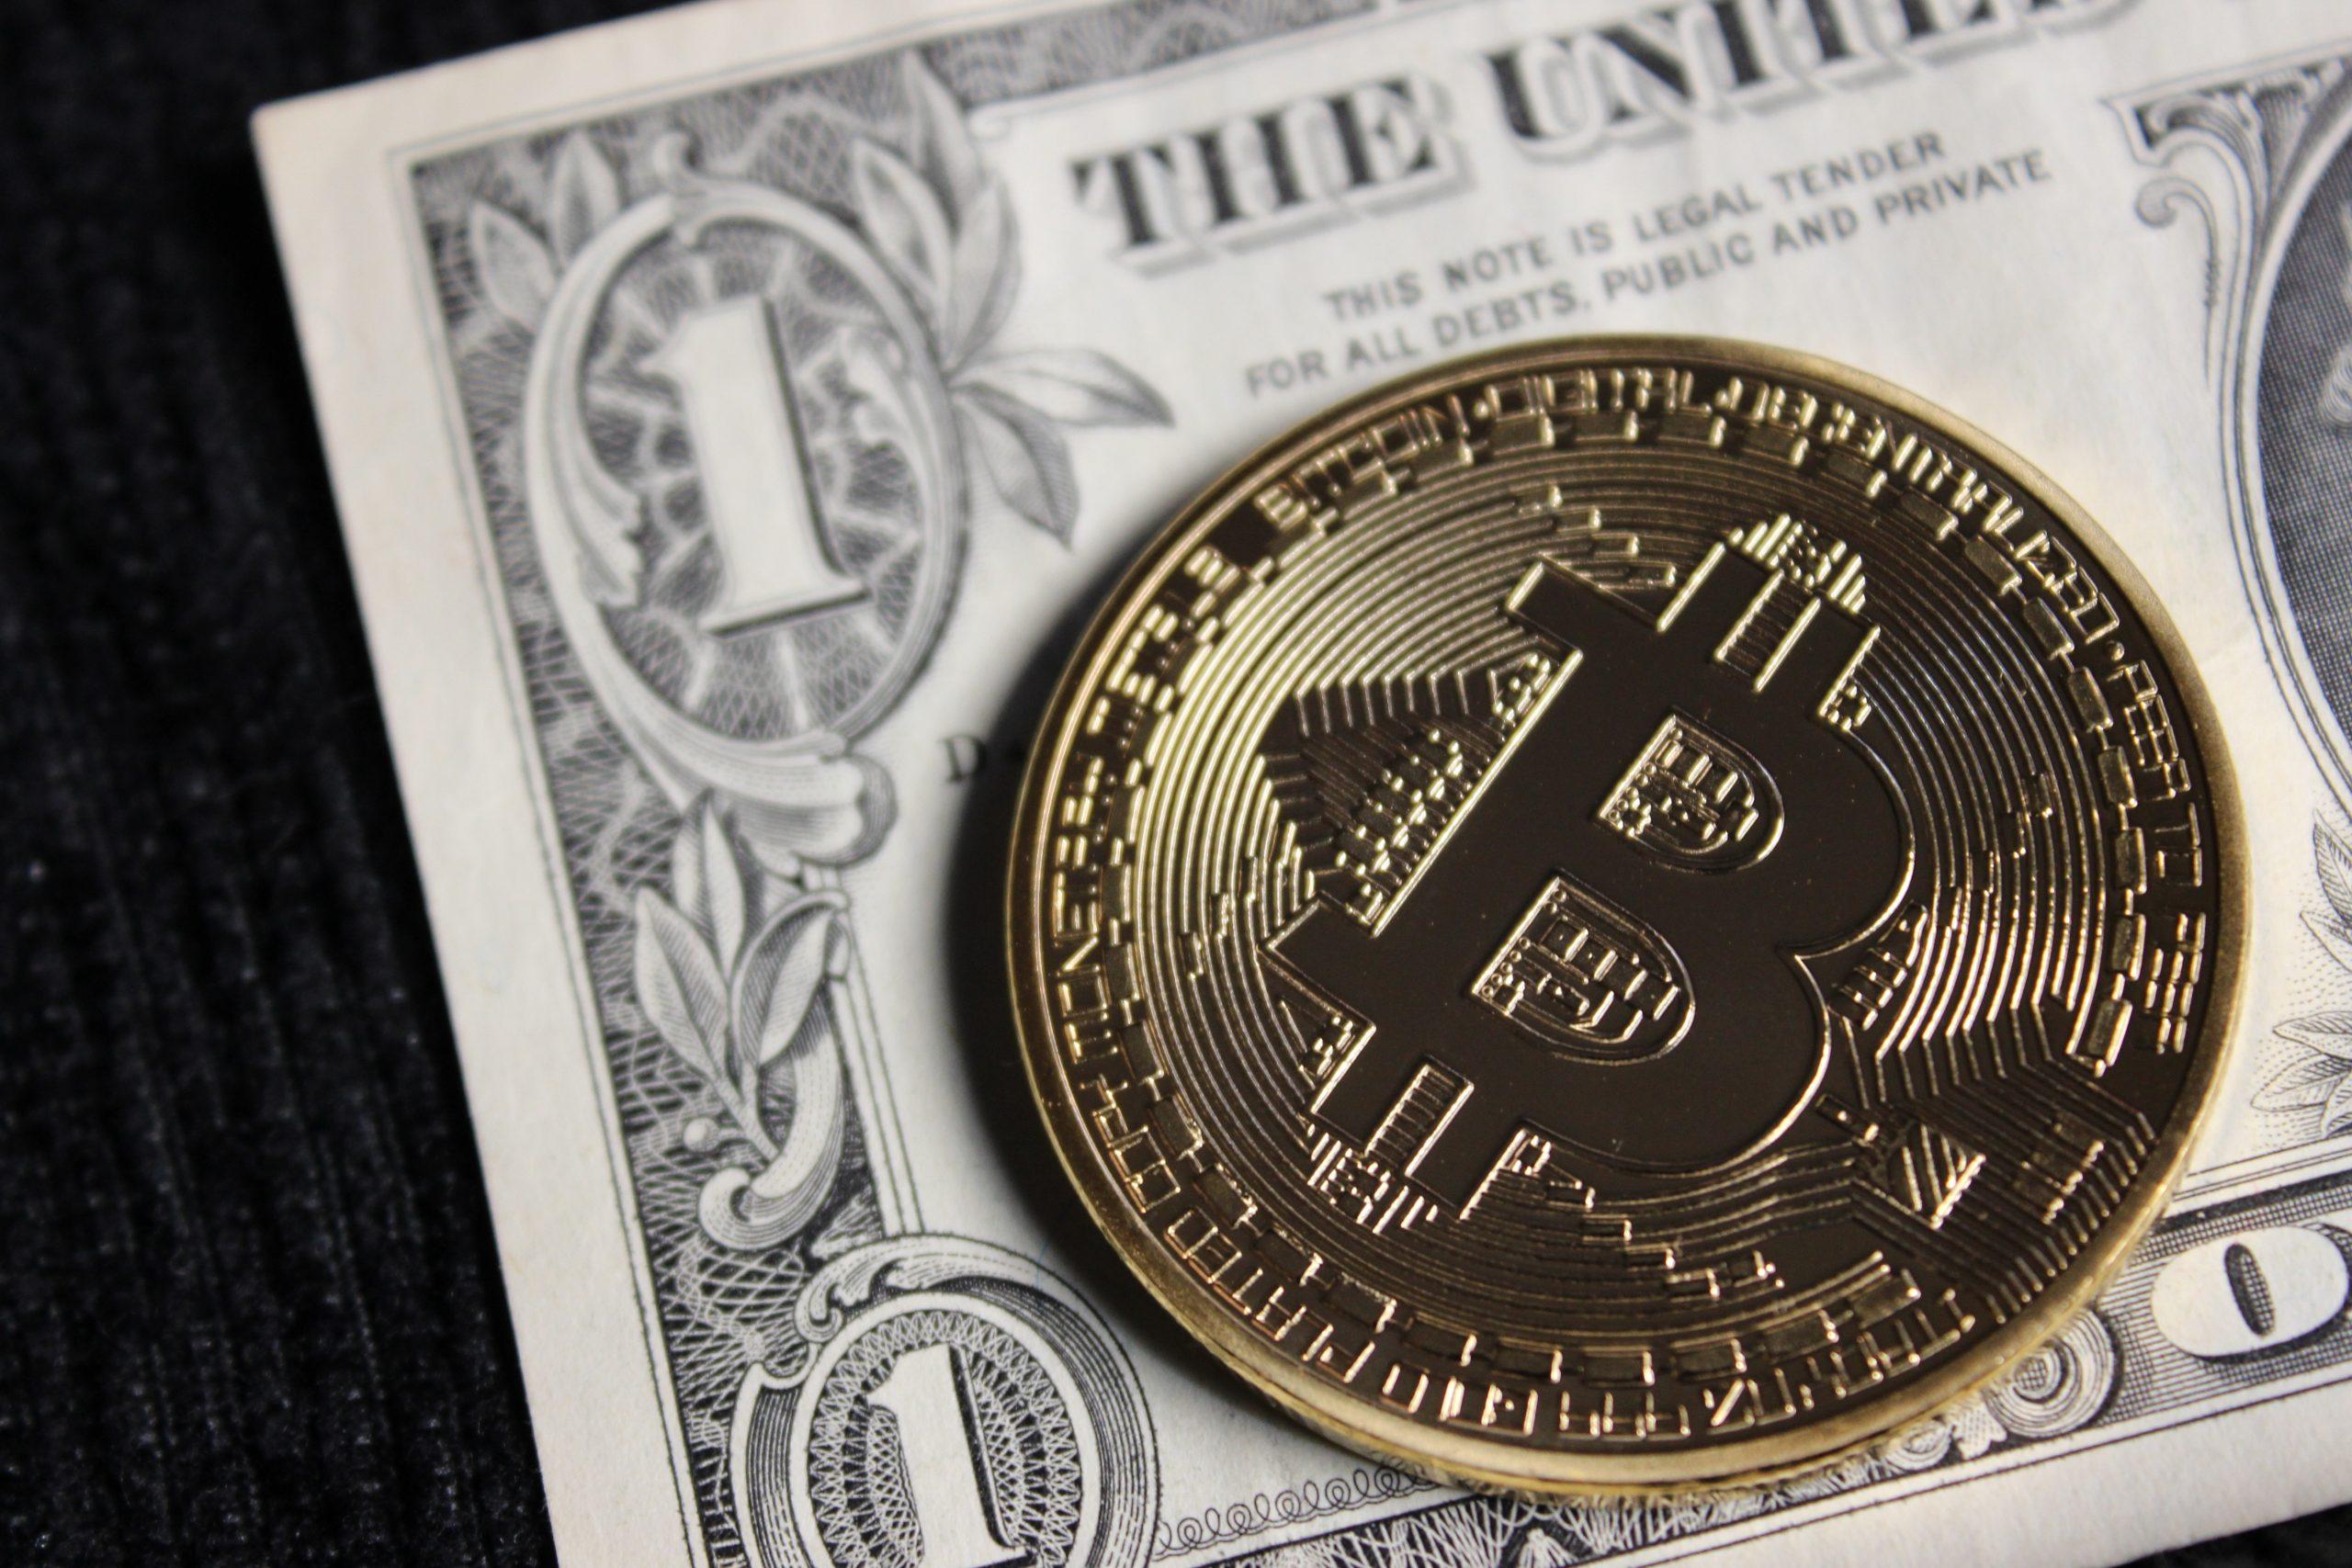 Shane mcleay mining bitcoins betting expert academy